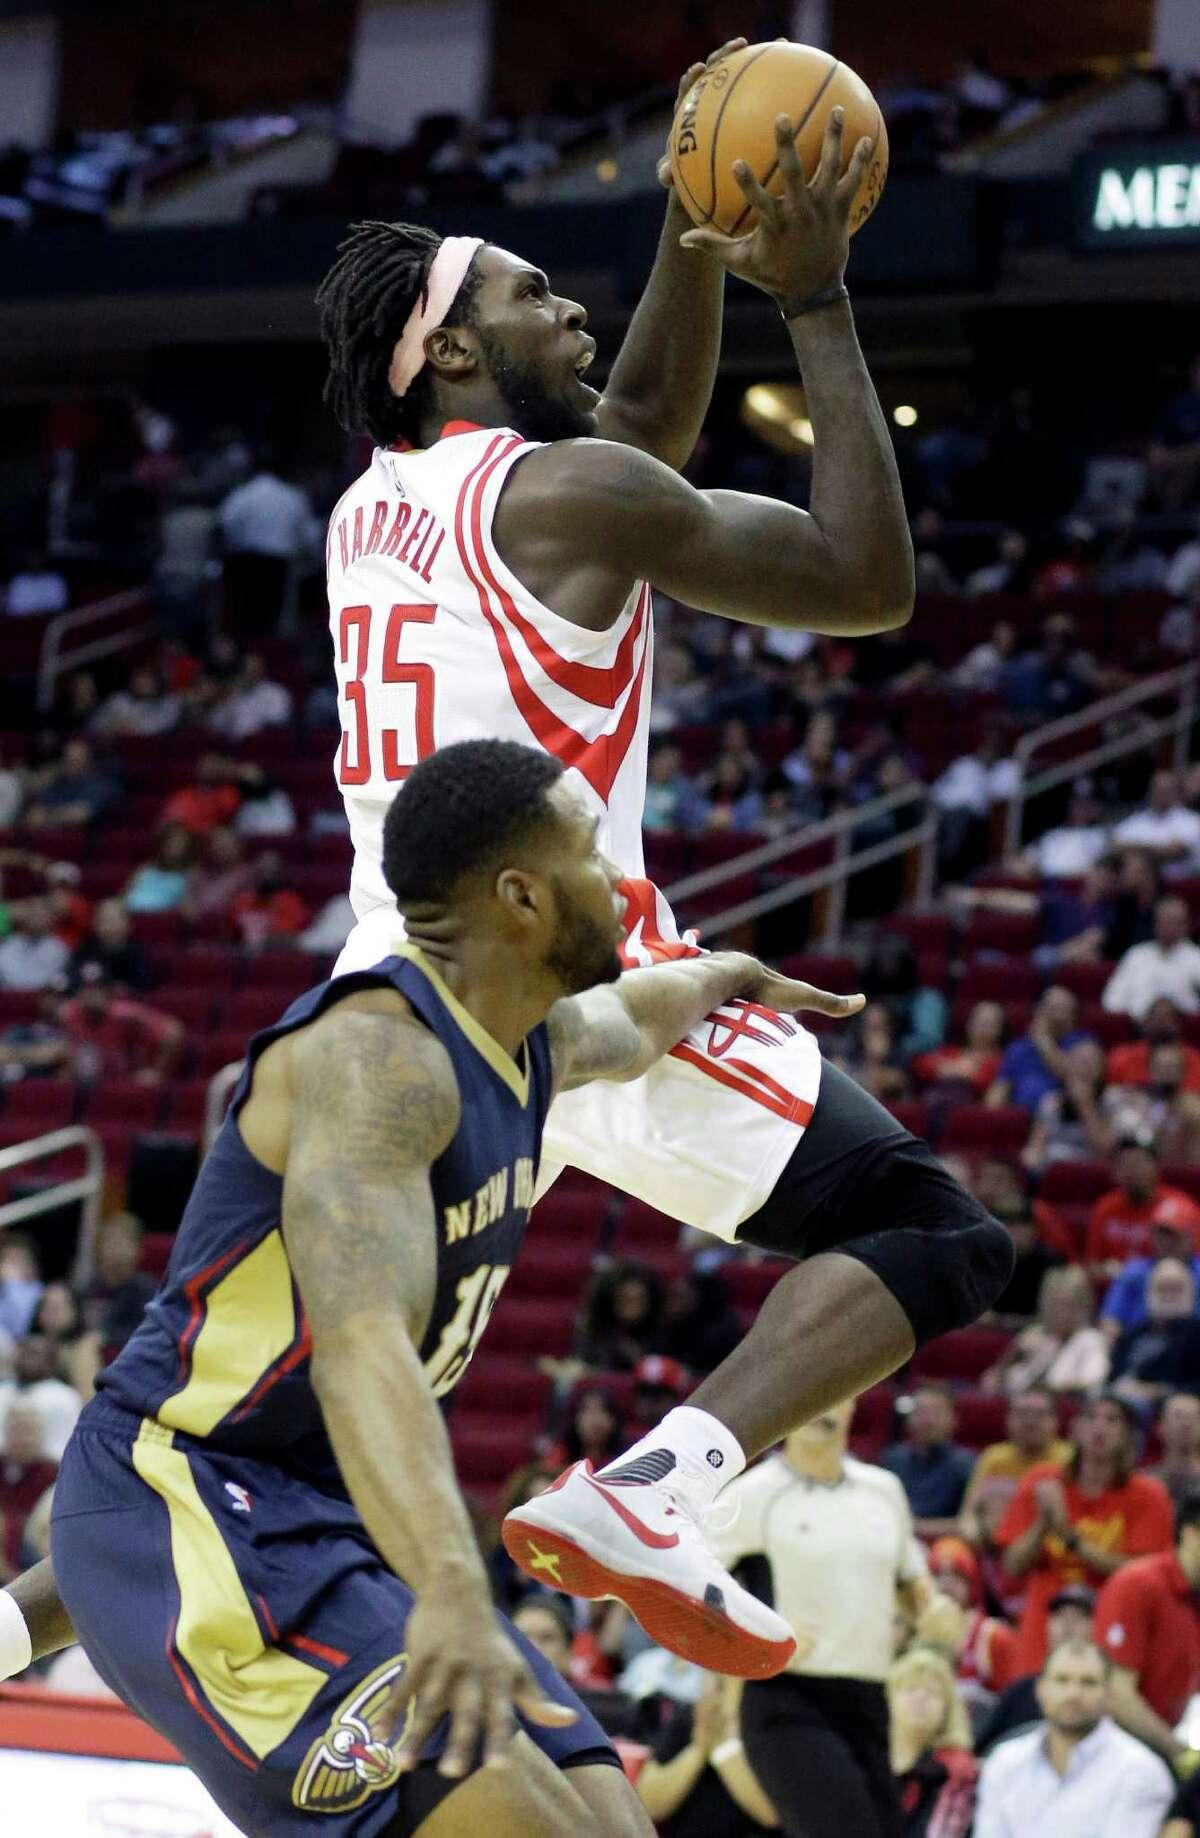 Rockets rookie forward Montrezl Harrell is shooting 60.9 percent in the preseason.